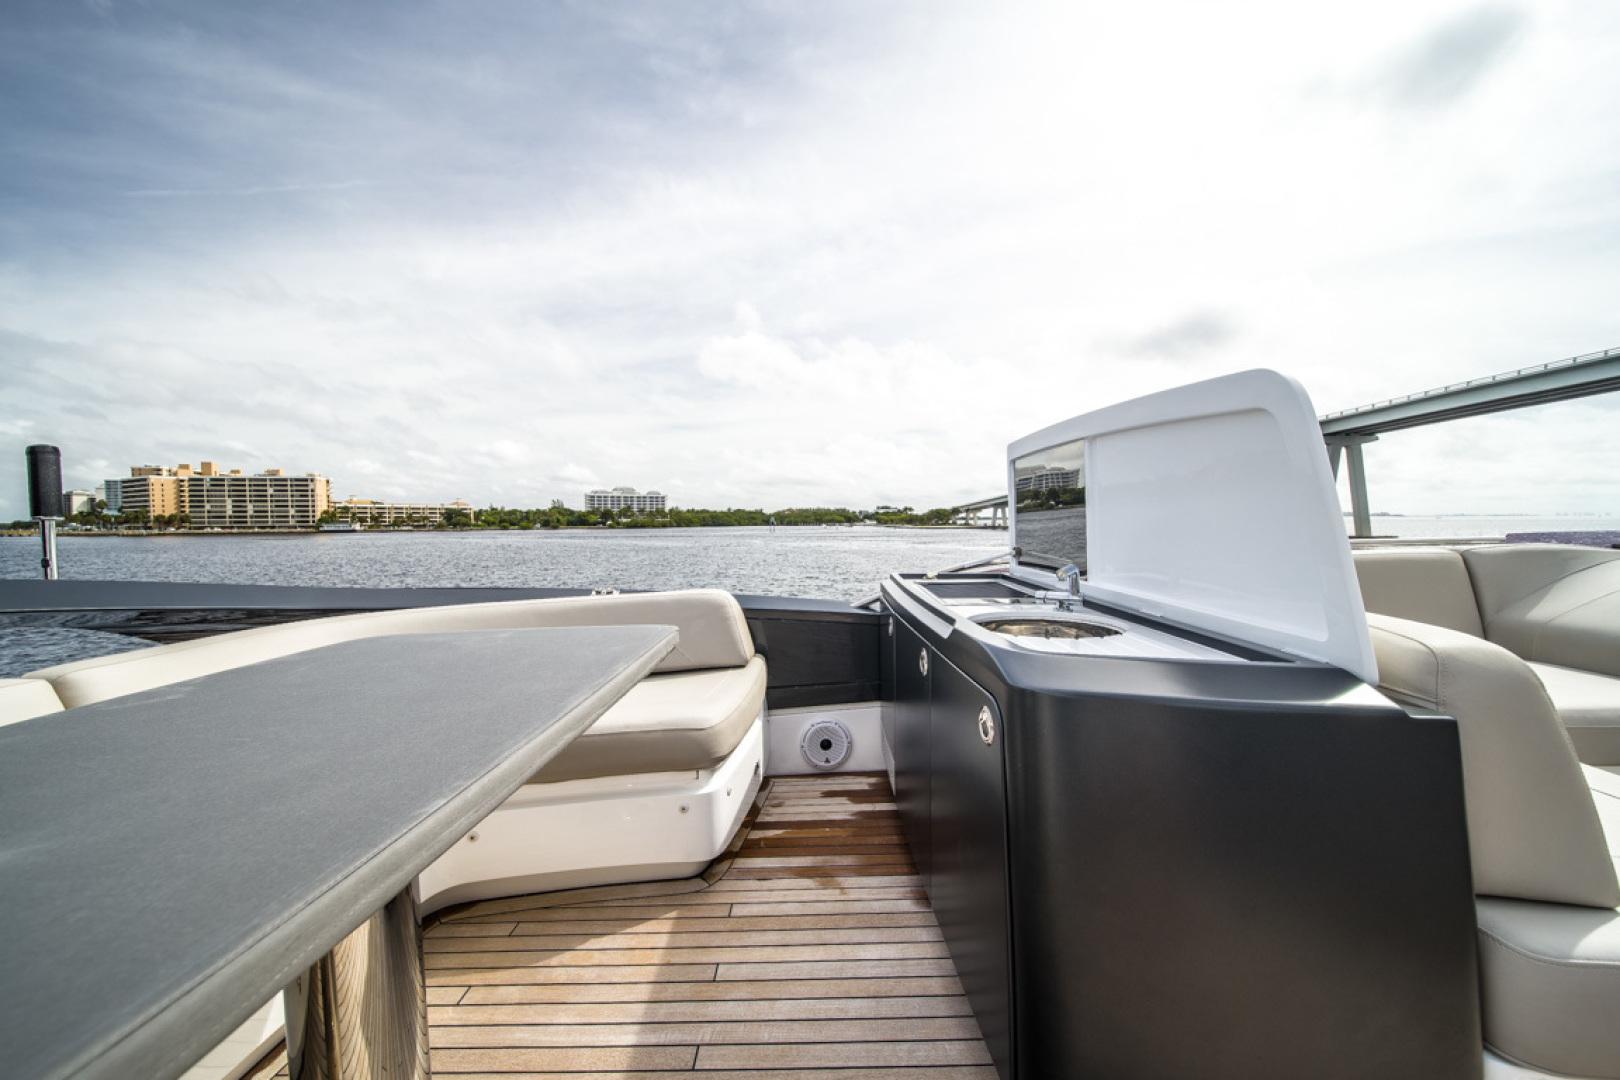 Princess-S65 2019-Paragon Cape Coral-Florida-United States-2019 65 Princess S65-Paragon-Flybridge Entertainment-1510307 | Thumbnail